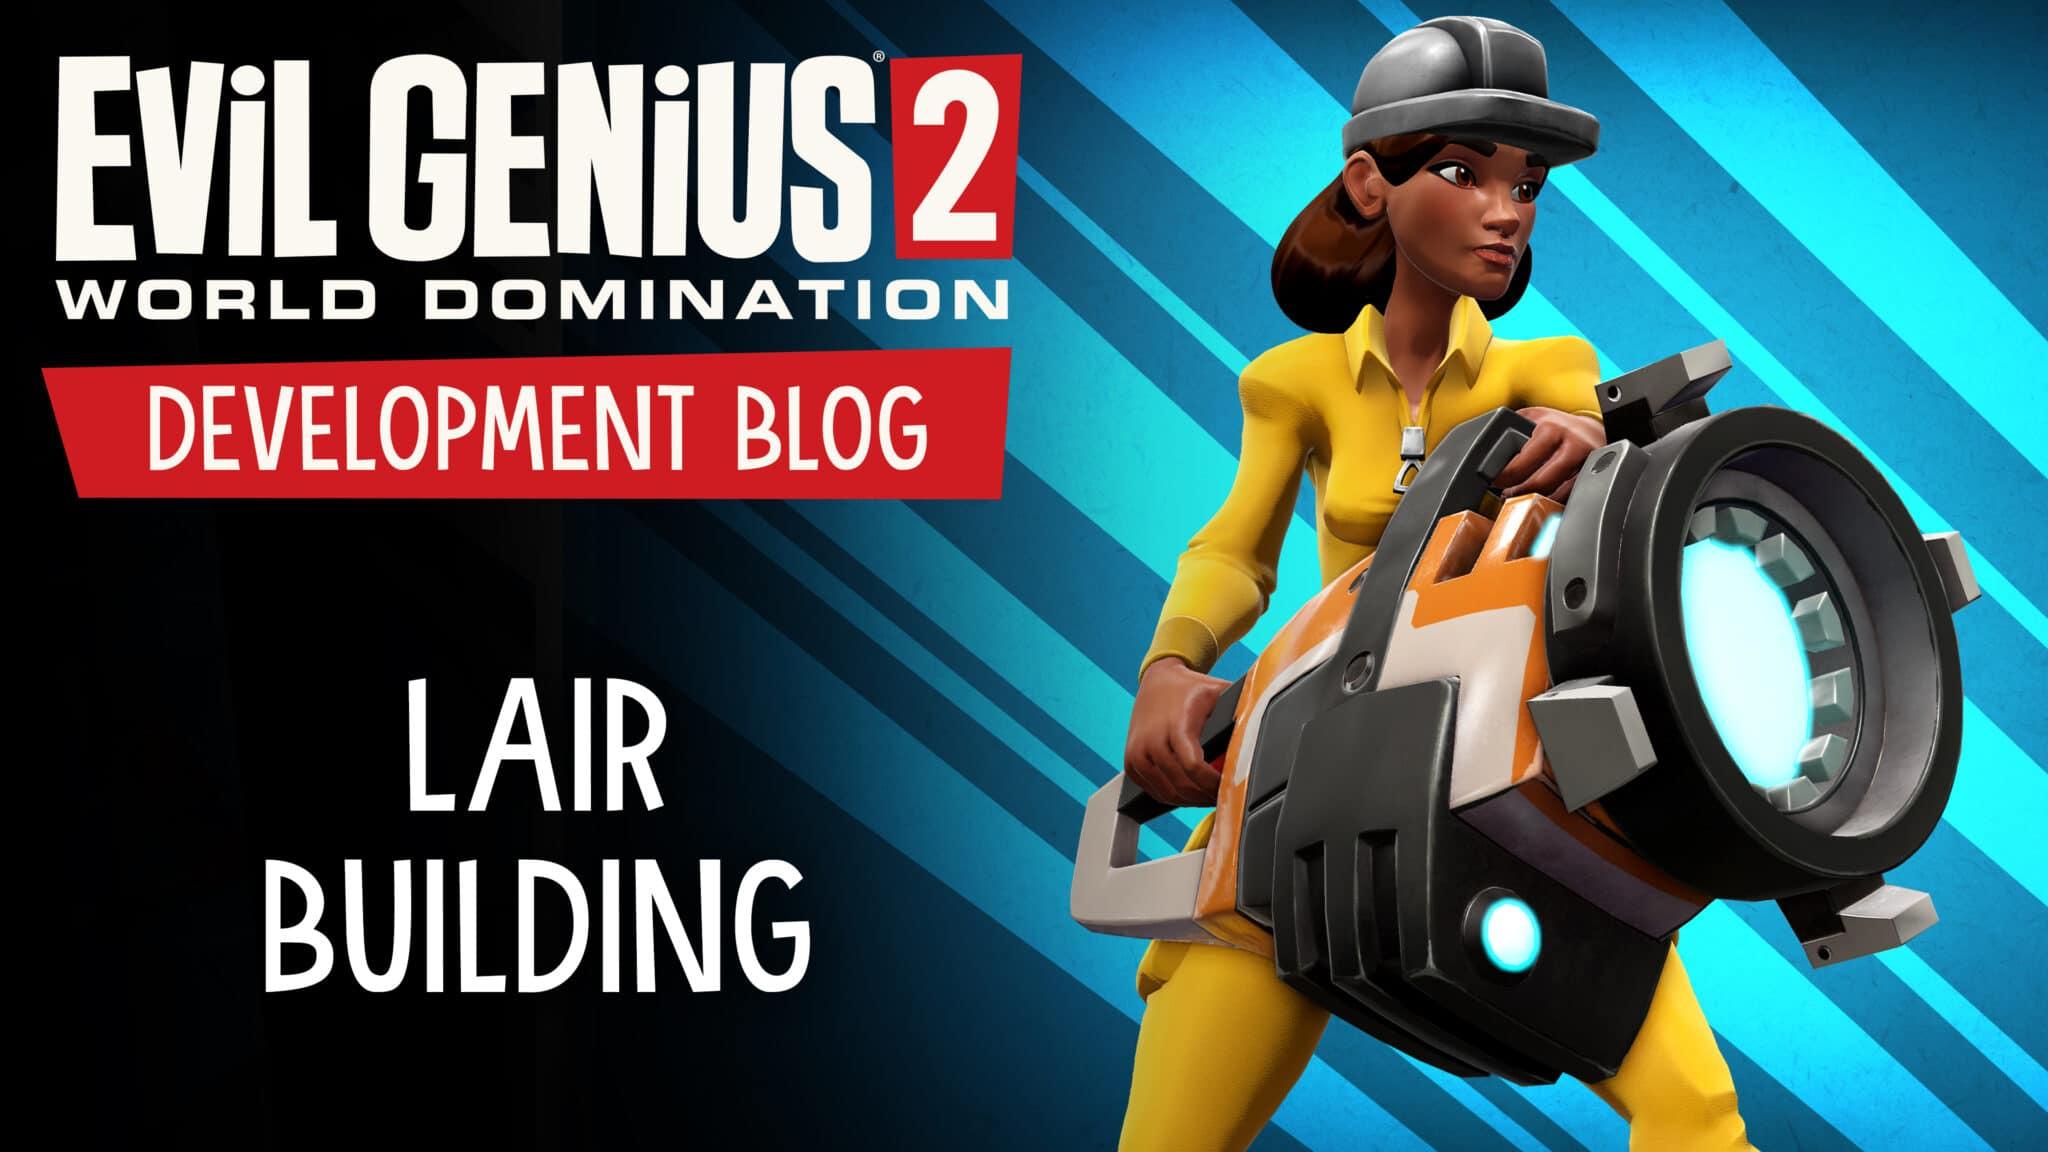 Development Blog – Lair Building!